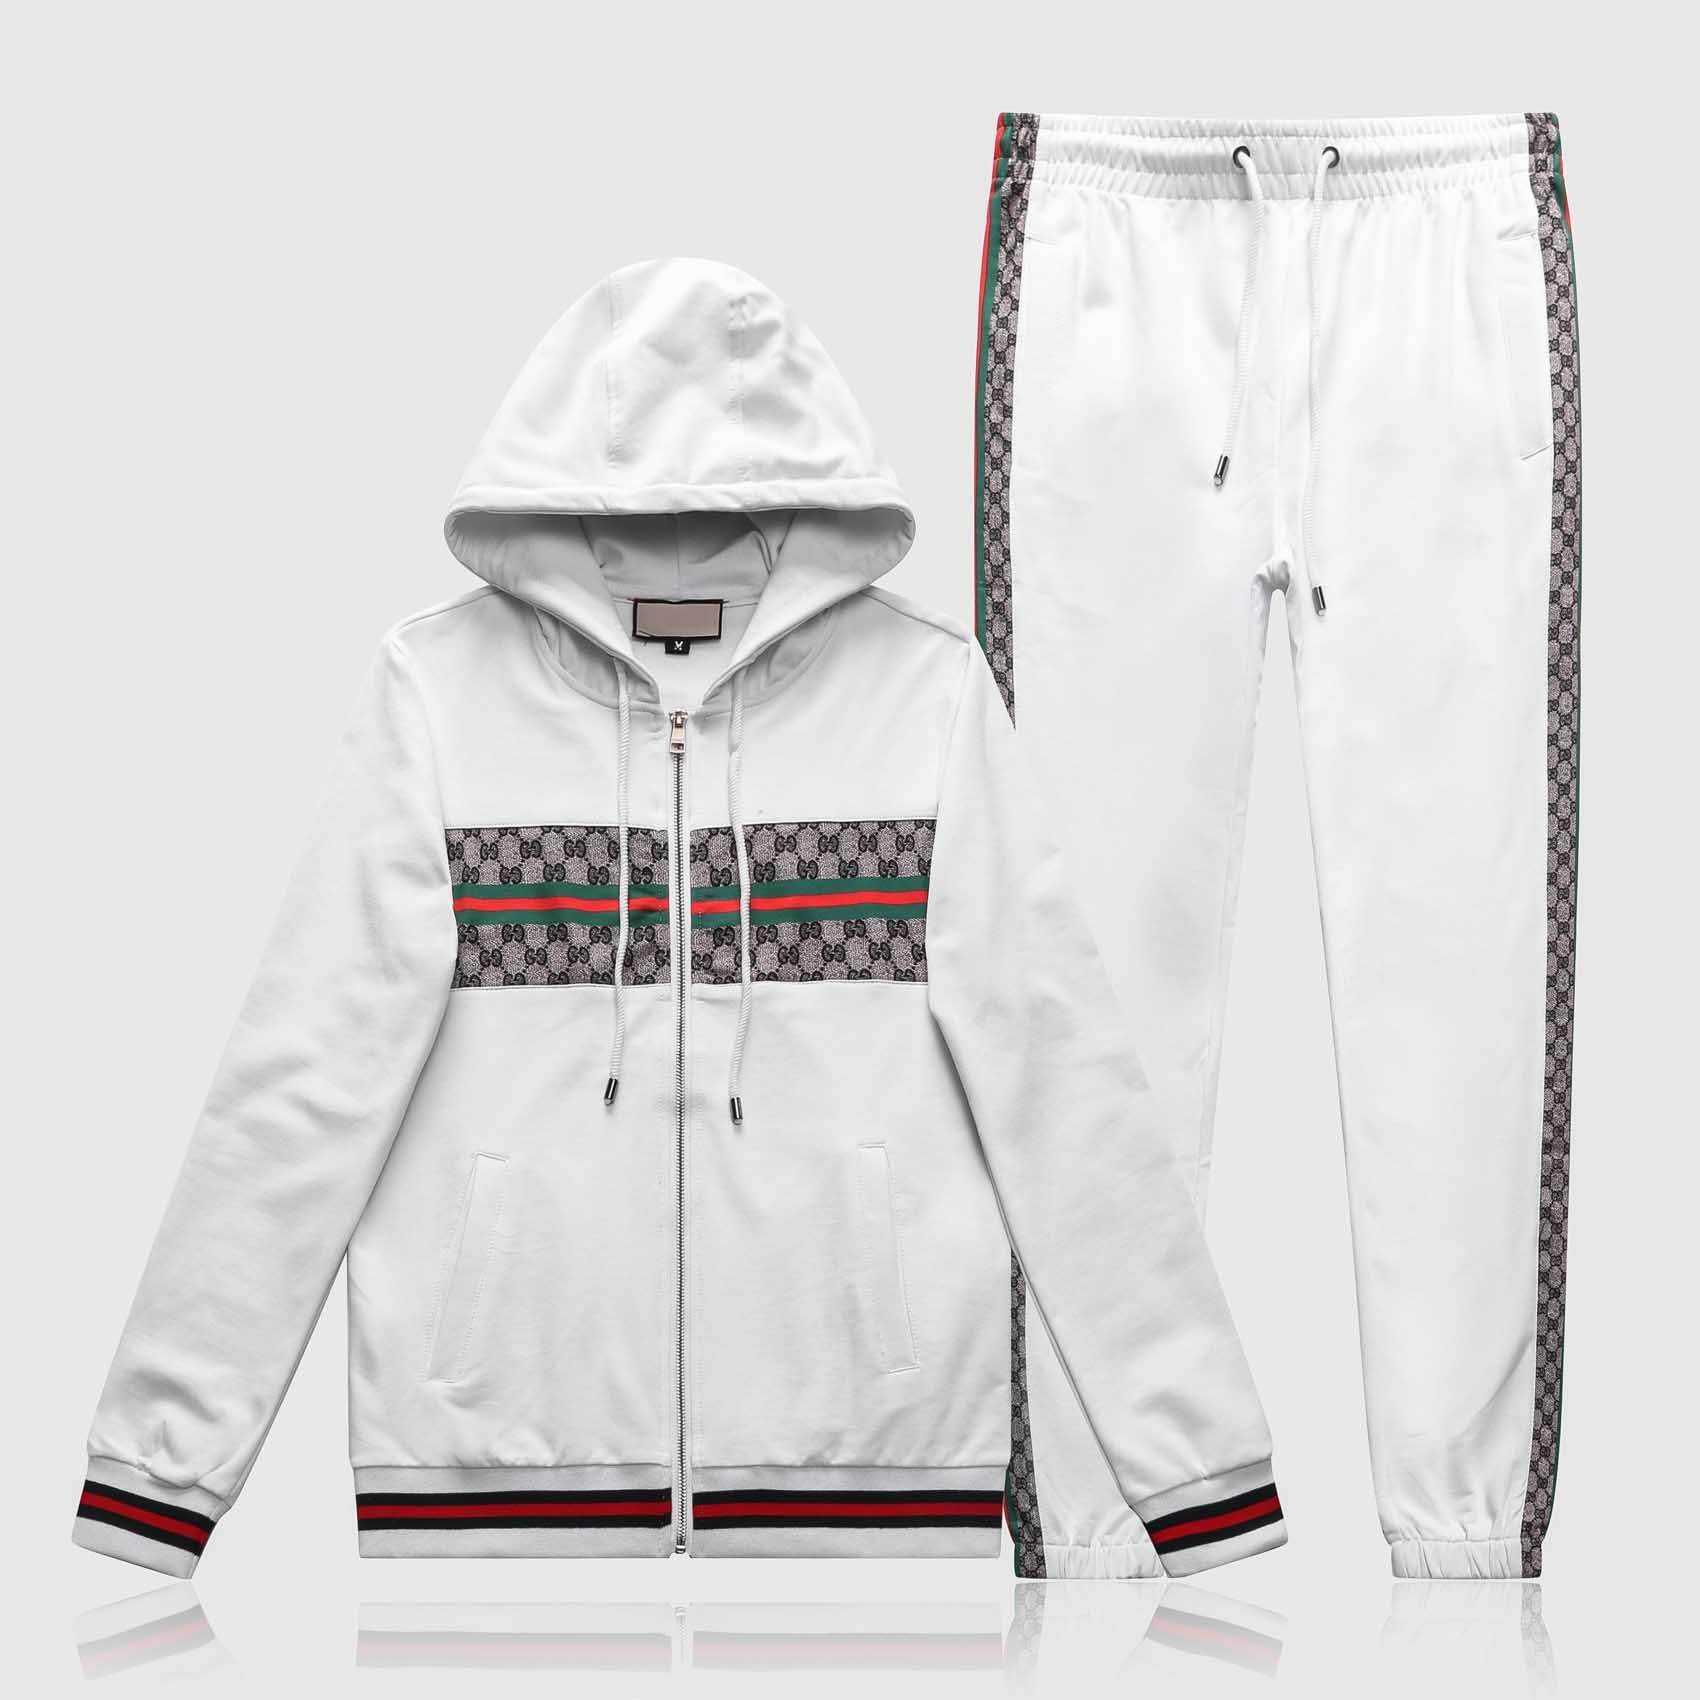 201819 Designer Anzug Männer Luxus Sweat Anzüge Herbst Markemens Tracksuits Jogger Anzüge Jacke + Pants Sets Freizeitfrauen Sport S